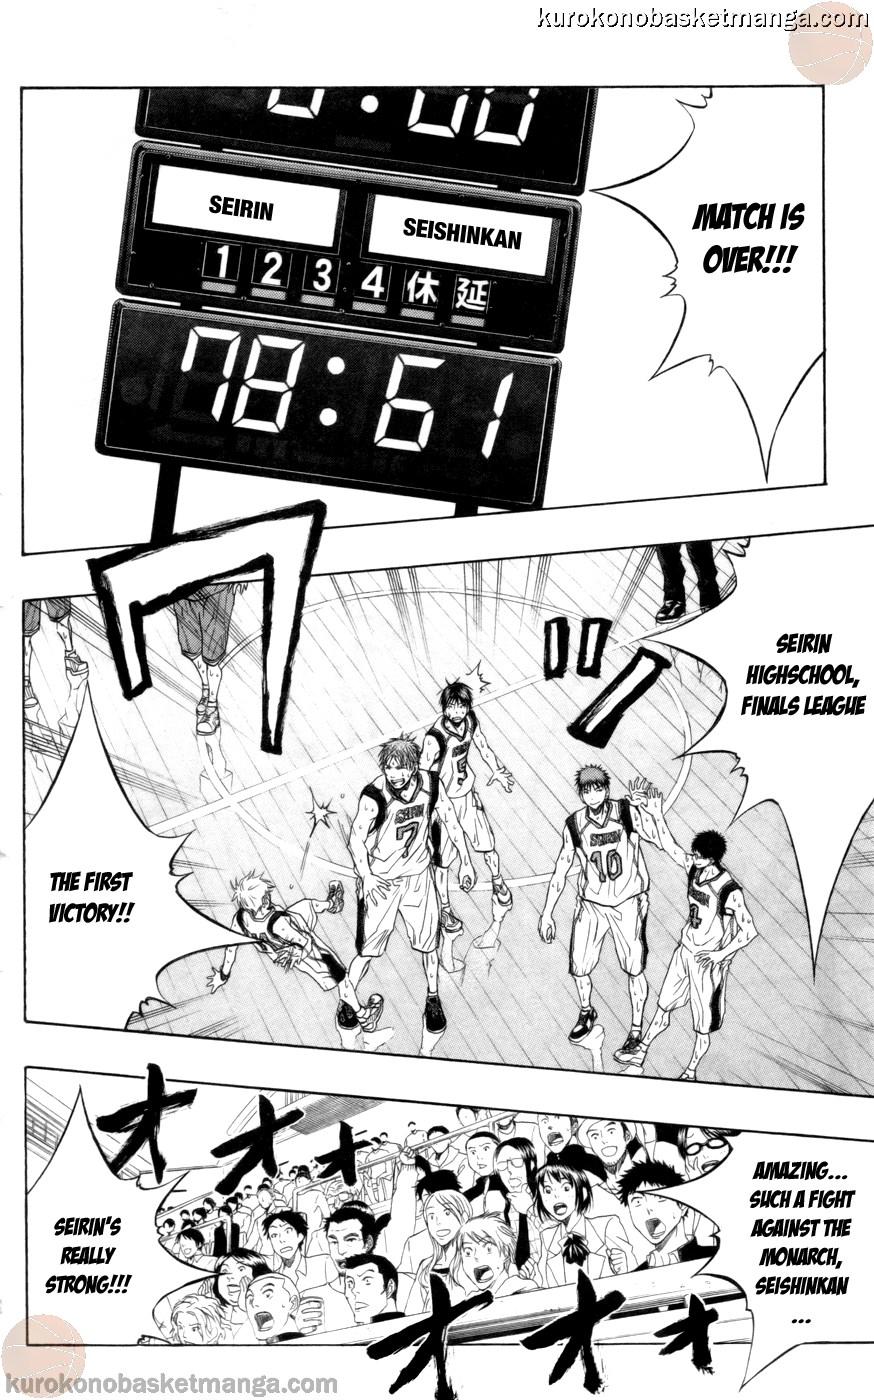 Kuroko no Basket Manga Chapter 84 - Image 16